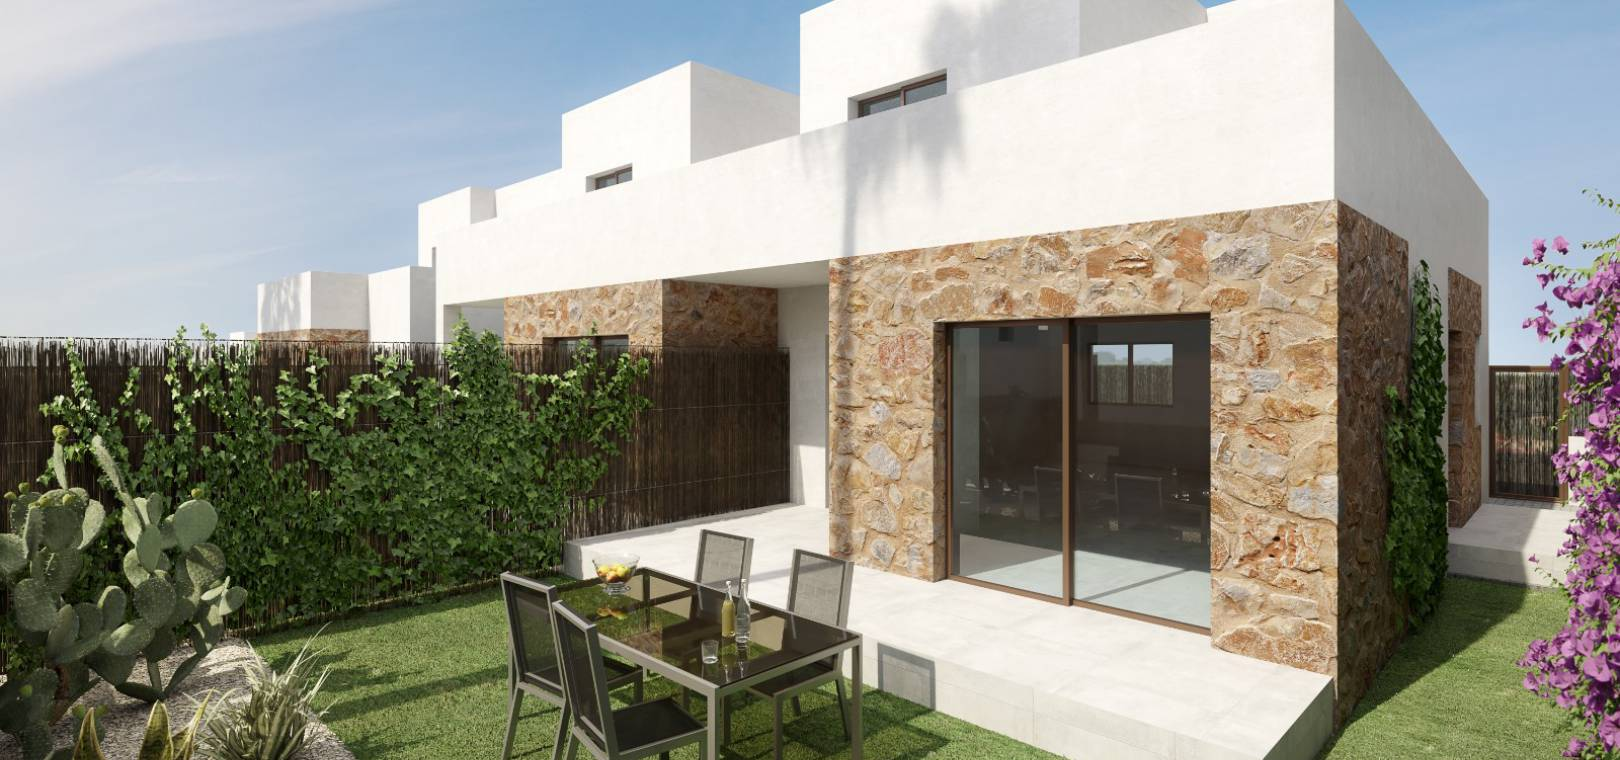 Villas ILIOS Villamartin For Sale semi-detached villa